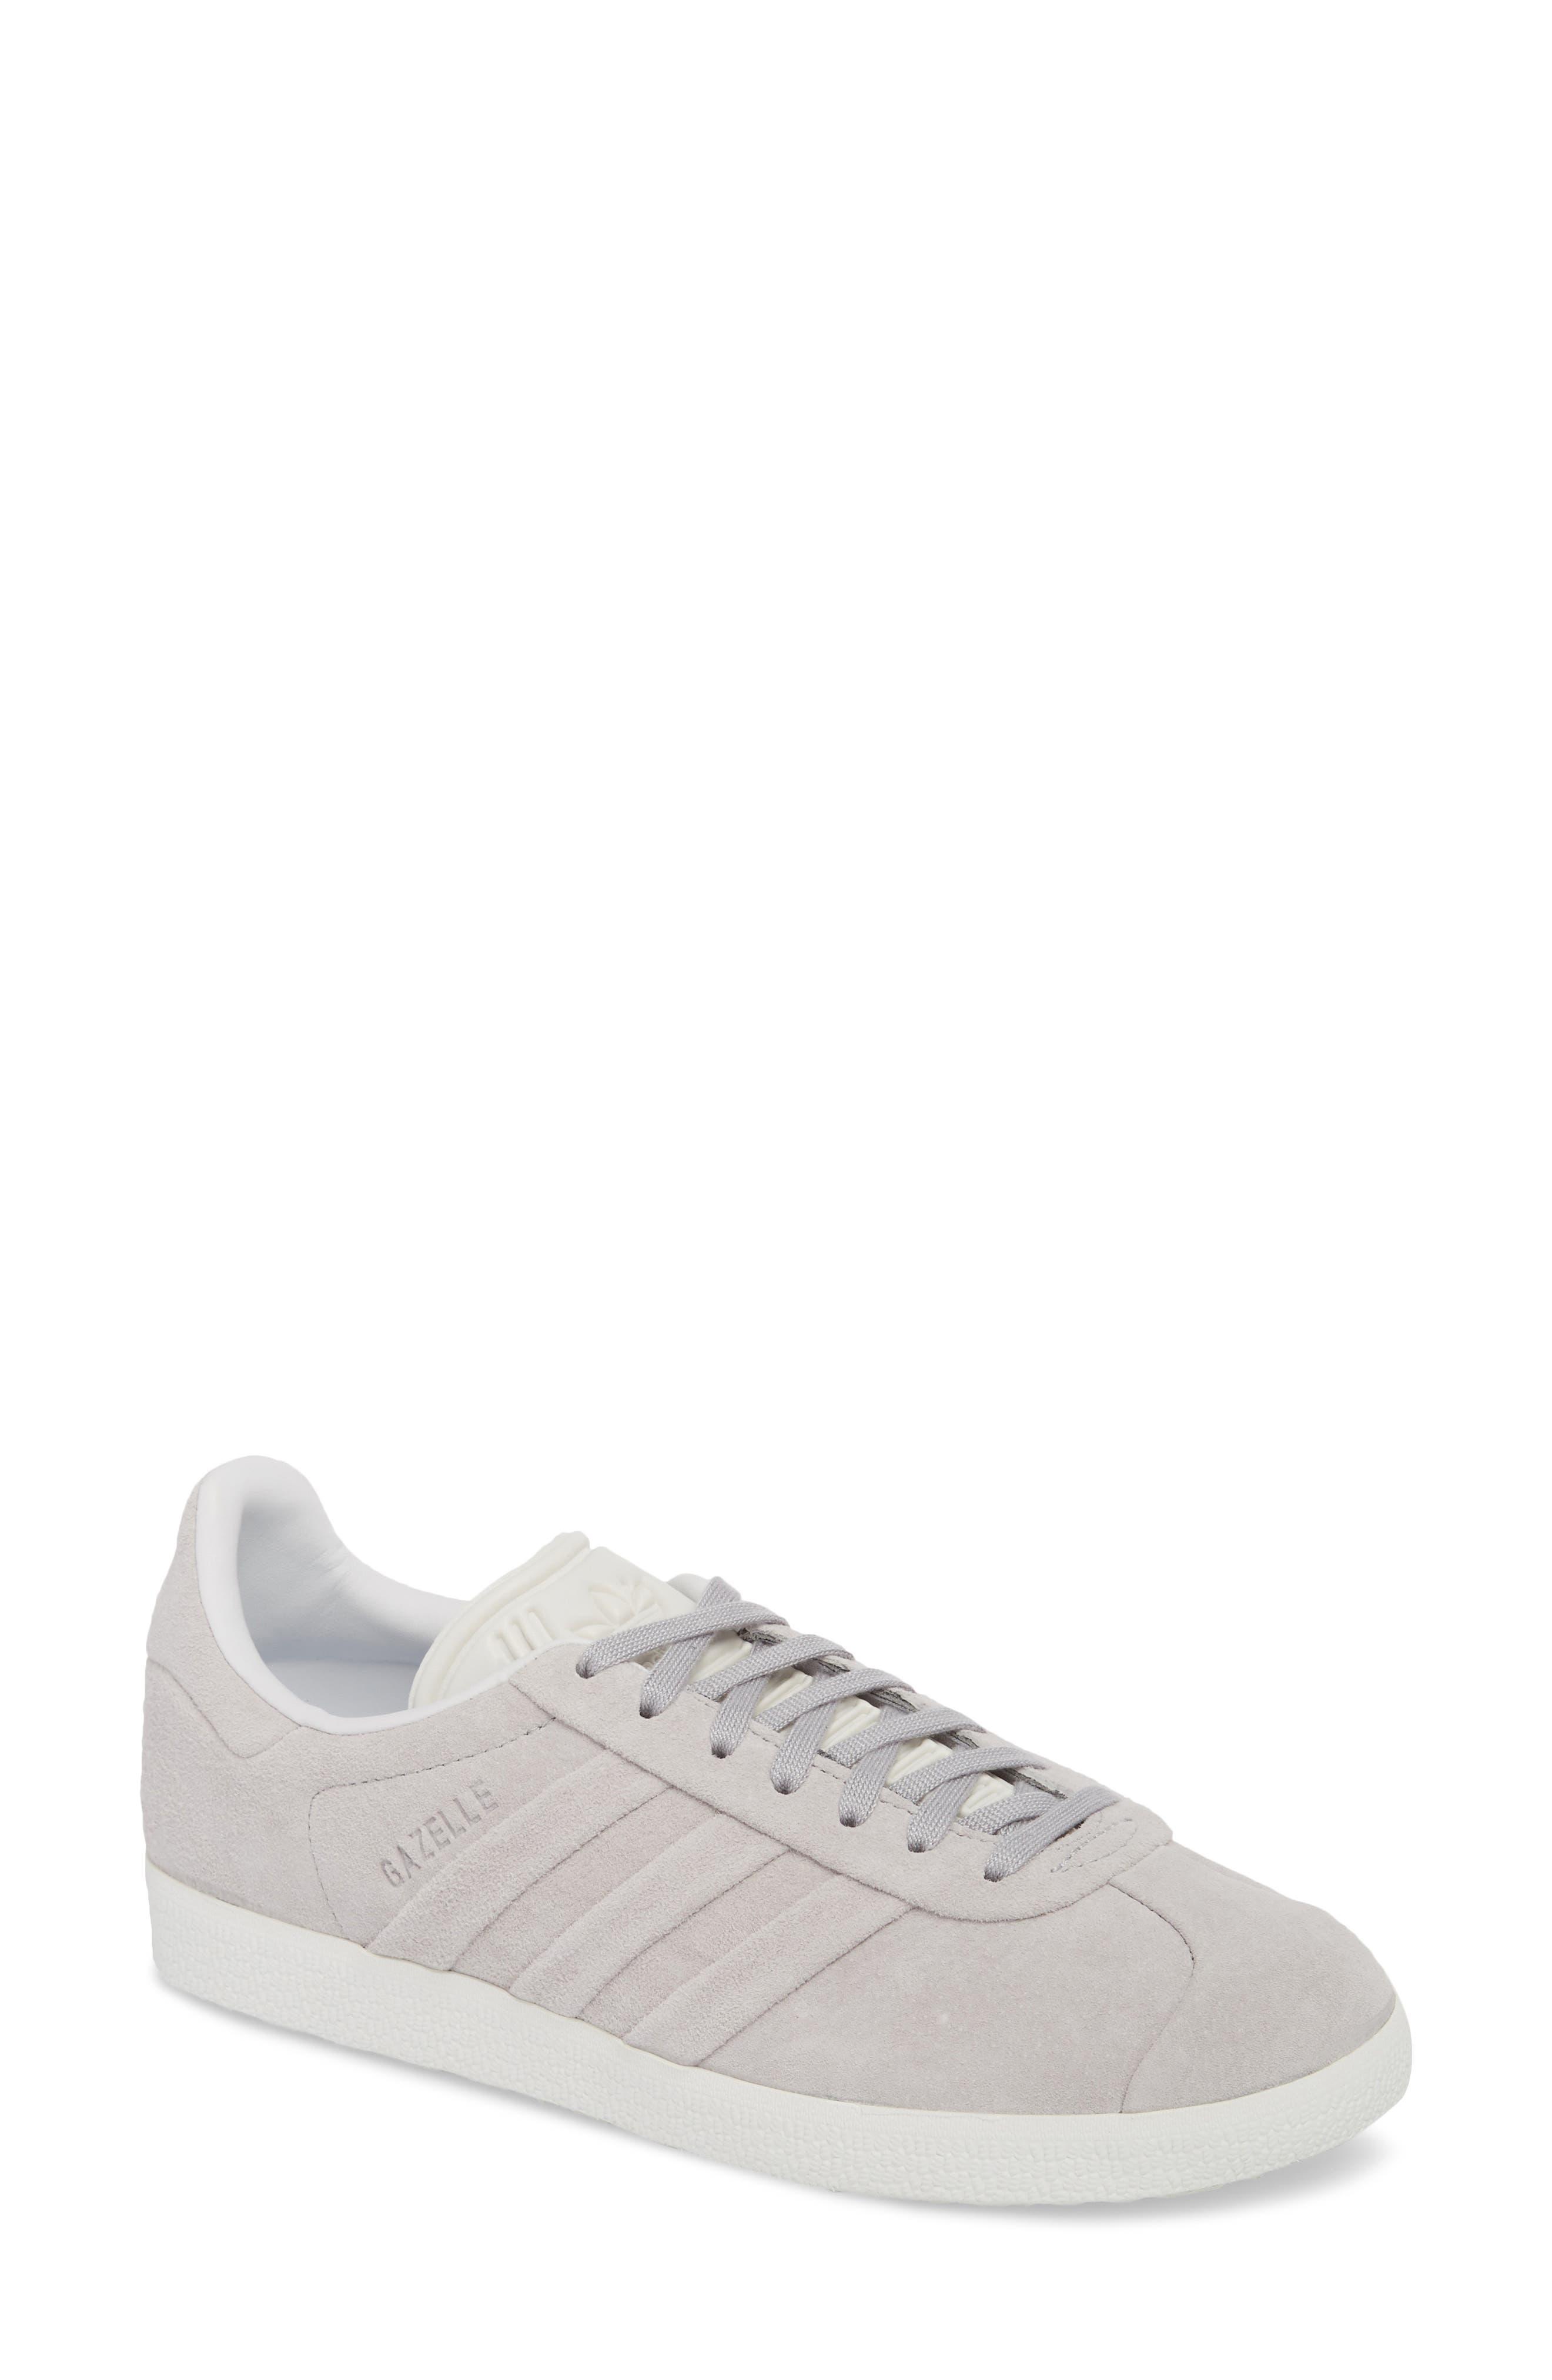 Gazelle Stitch & Turn Sneaker,                         Main,                         color, GREY/ GREY/ WHITE